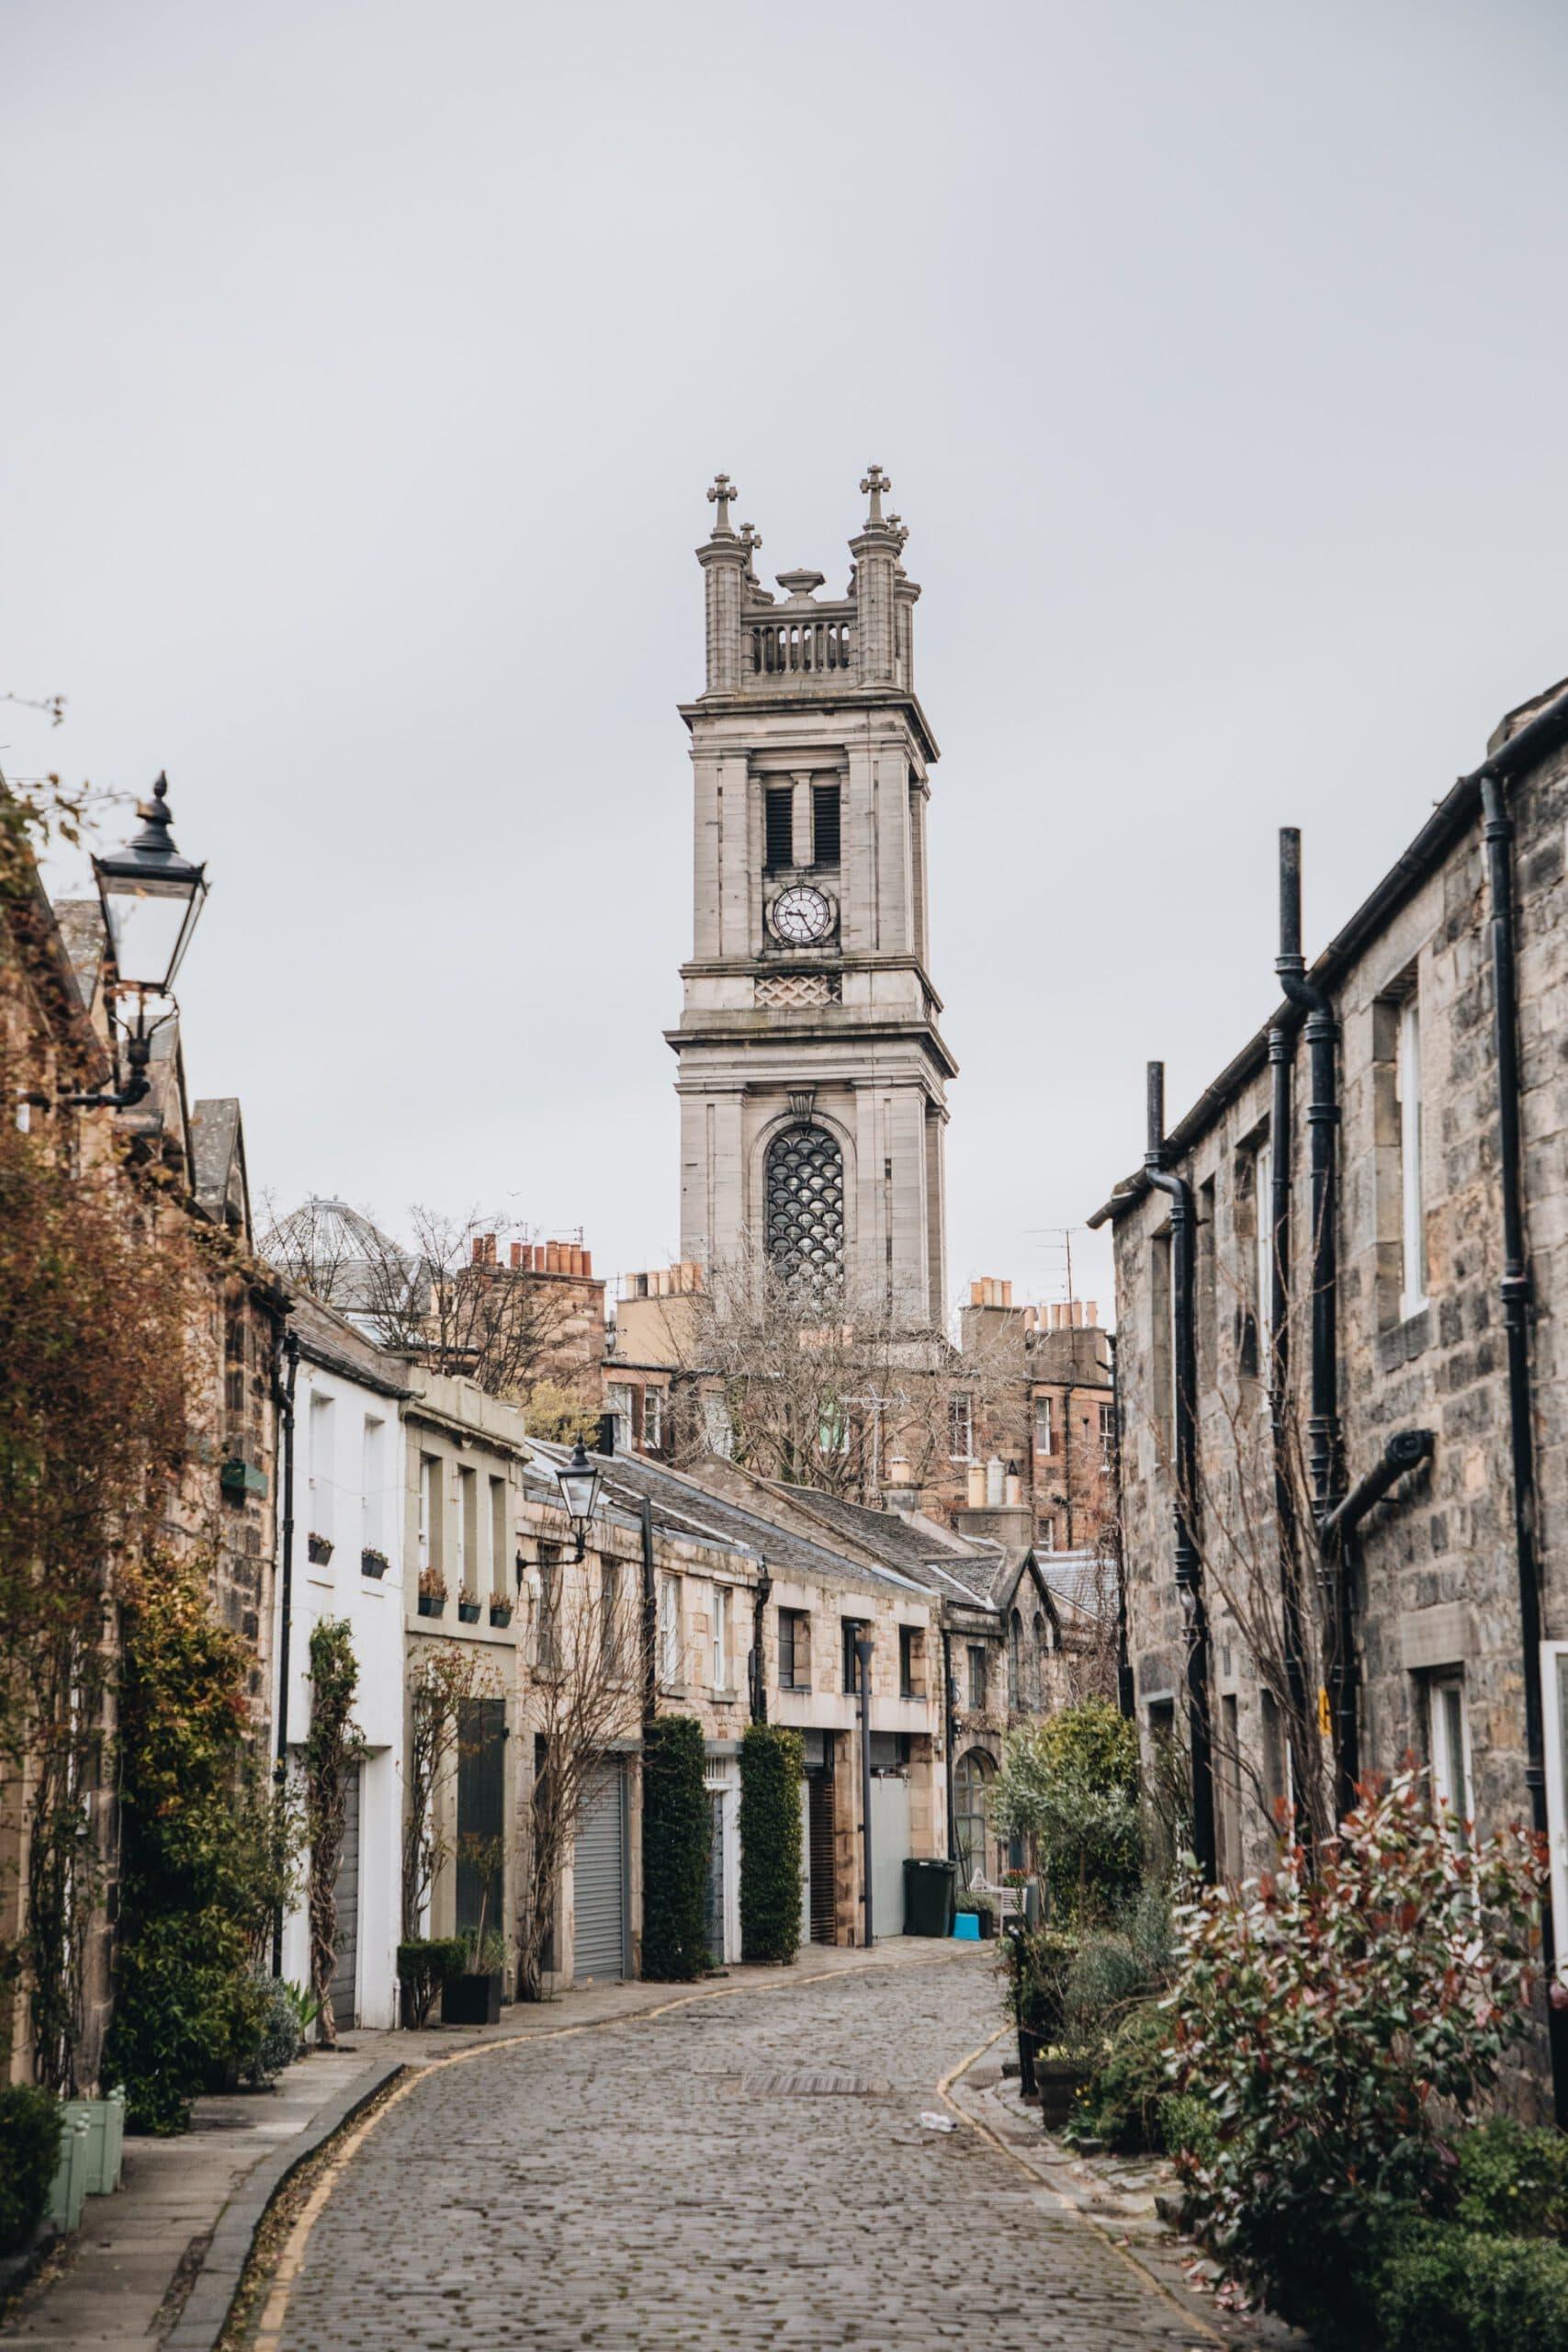 engeland-edinburgh-straatje-kerk-huizen